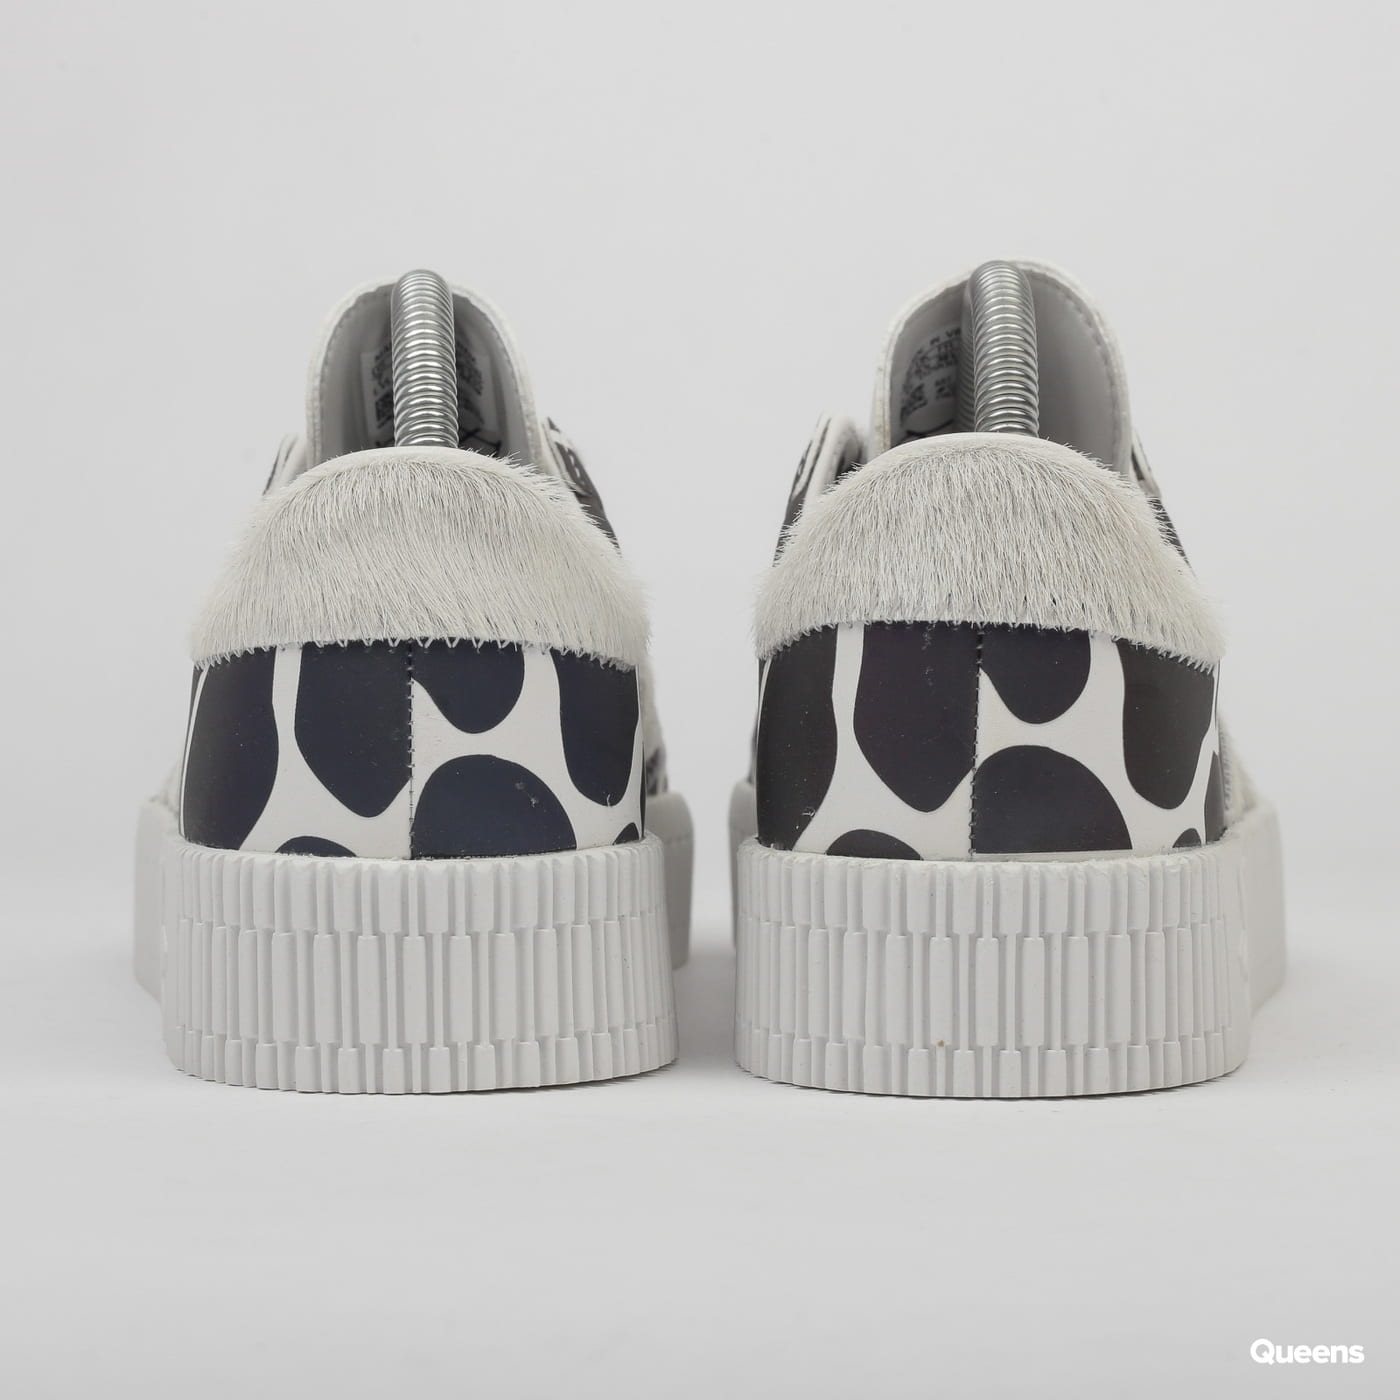 adidas Originals Sambarose W crywht / crywht / crywht